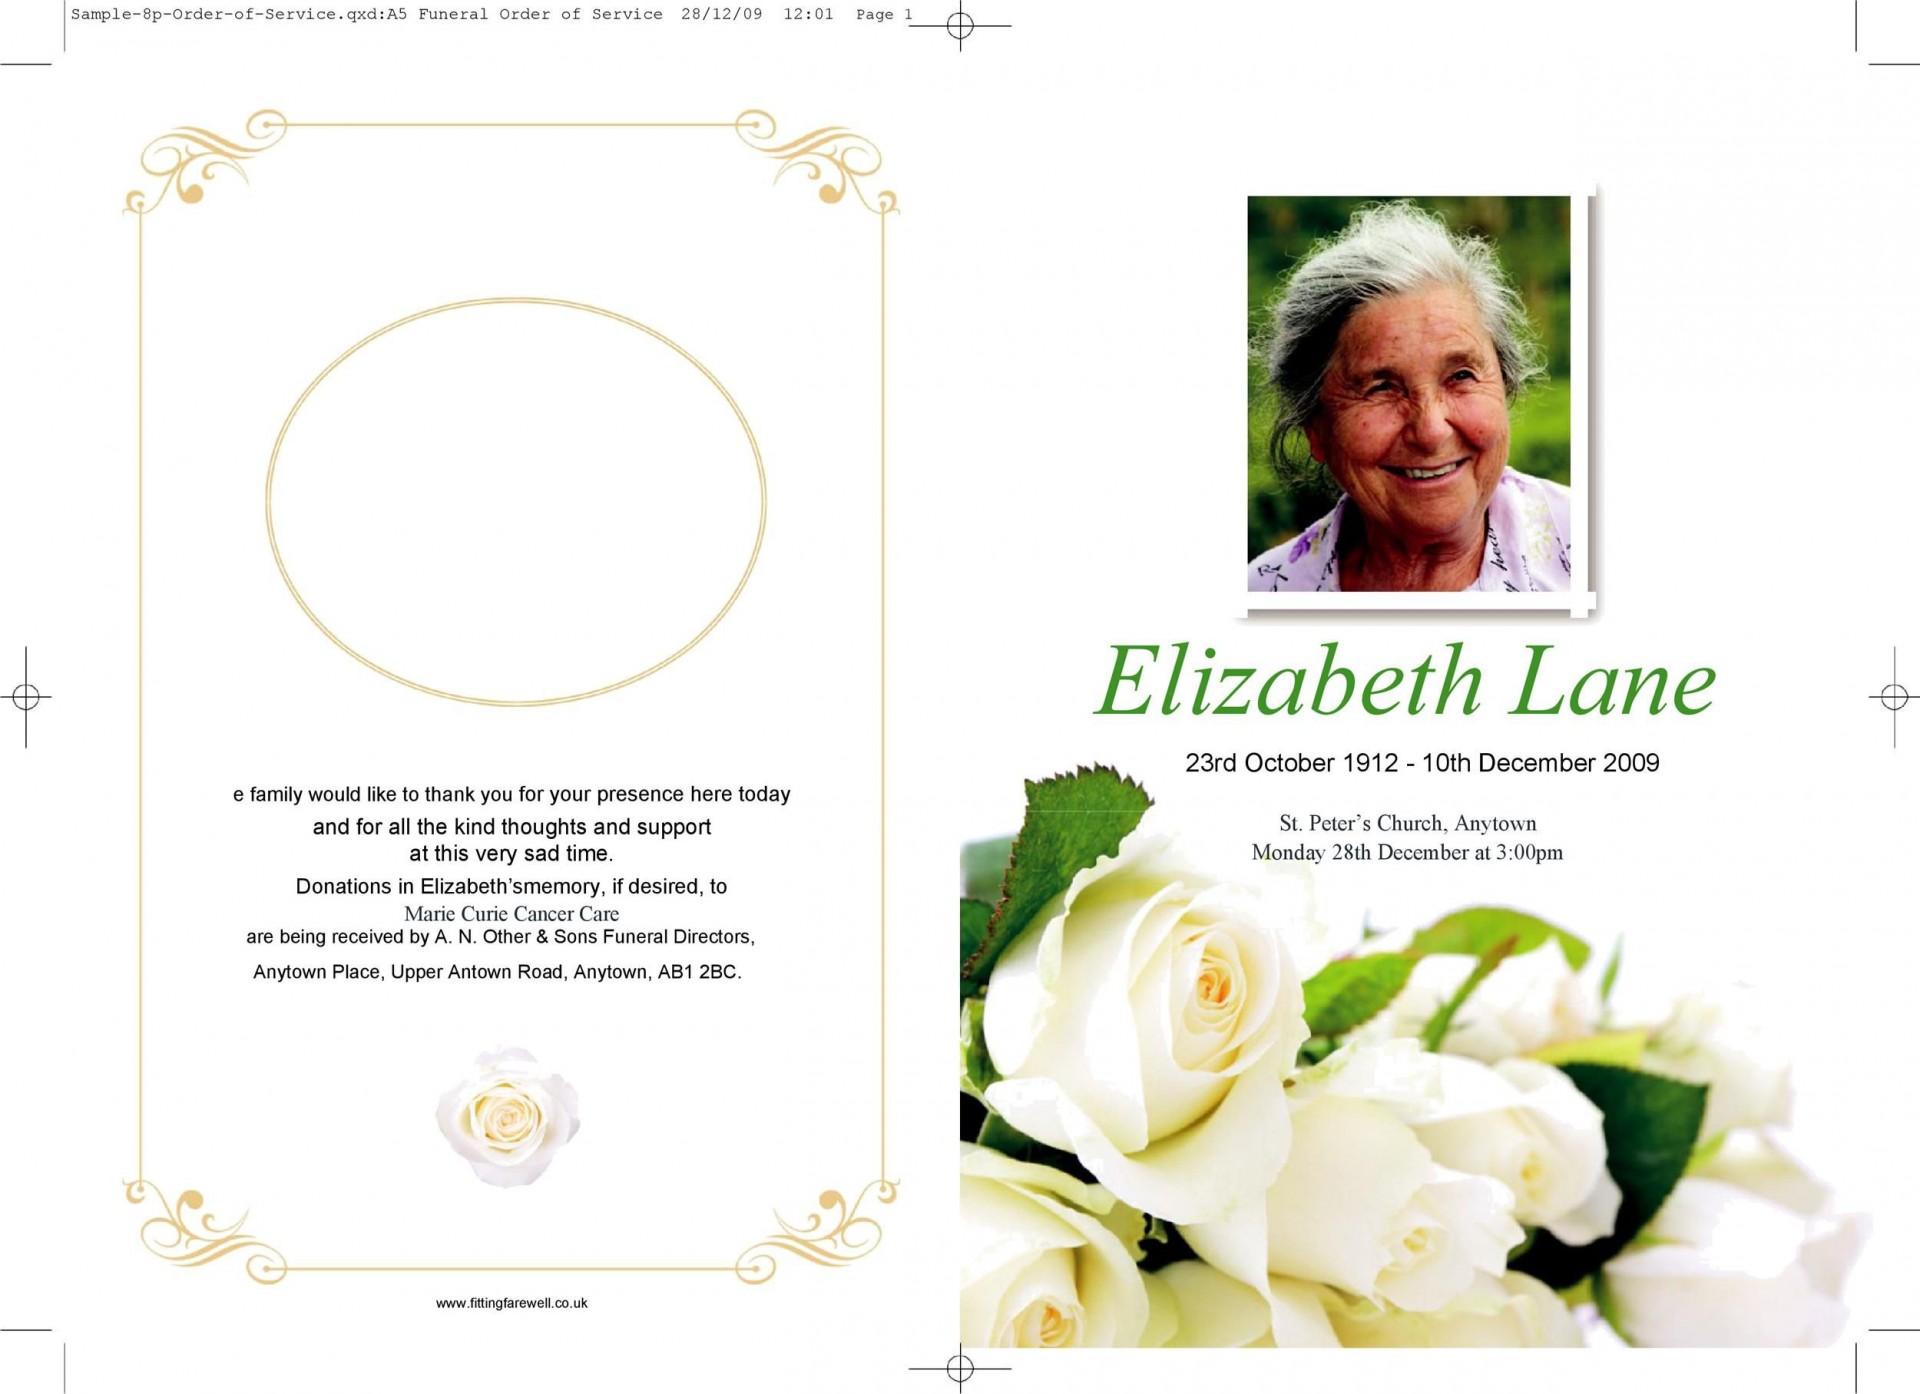 008 Beautiful Free Funeral Program Template Concept  Word Catholic Editable Pdf1920